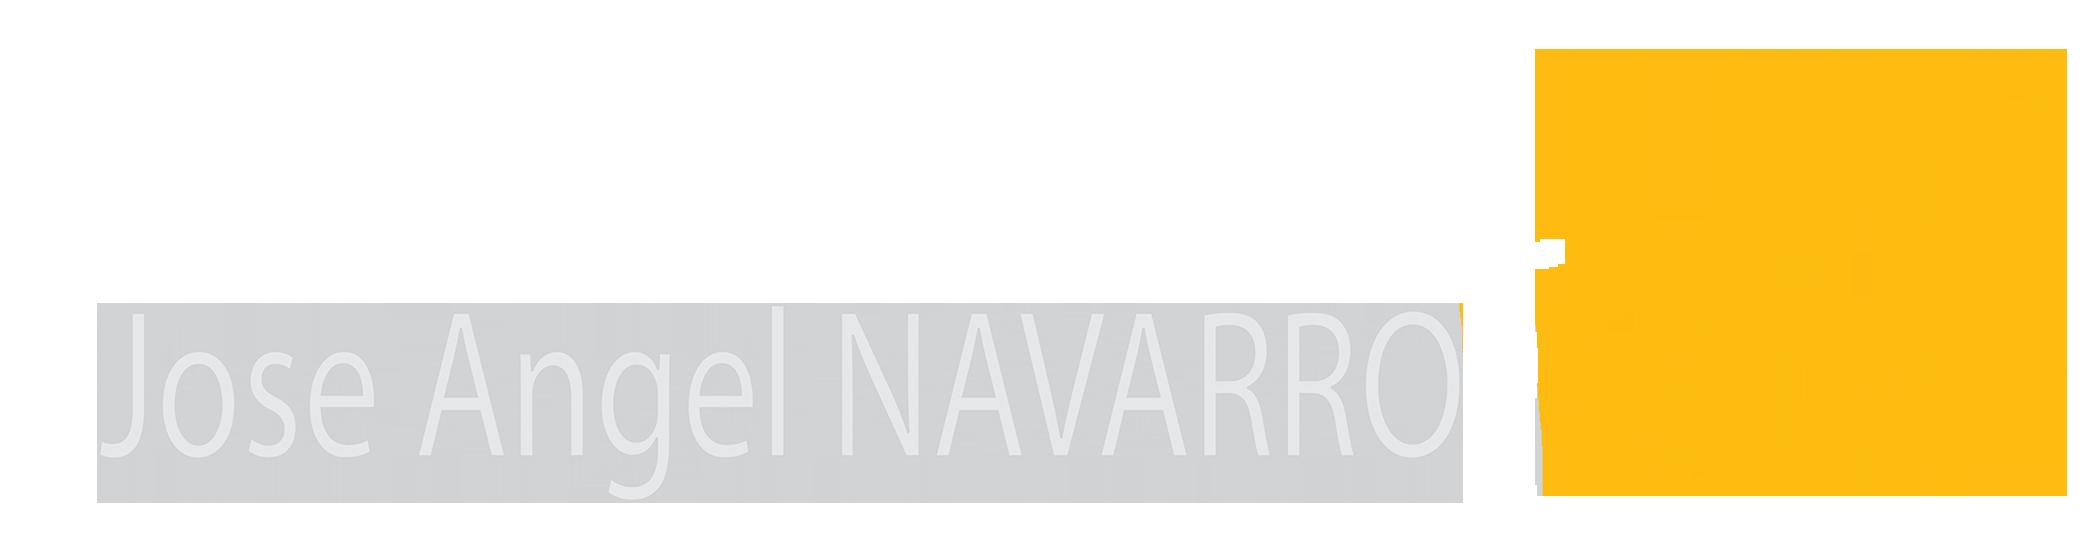 Jose Angel Navarro Logo